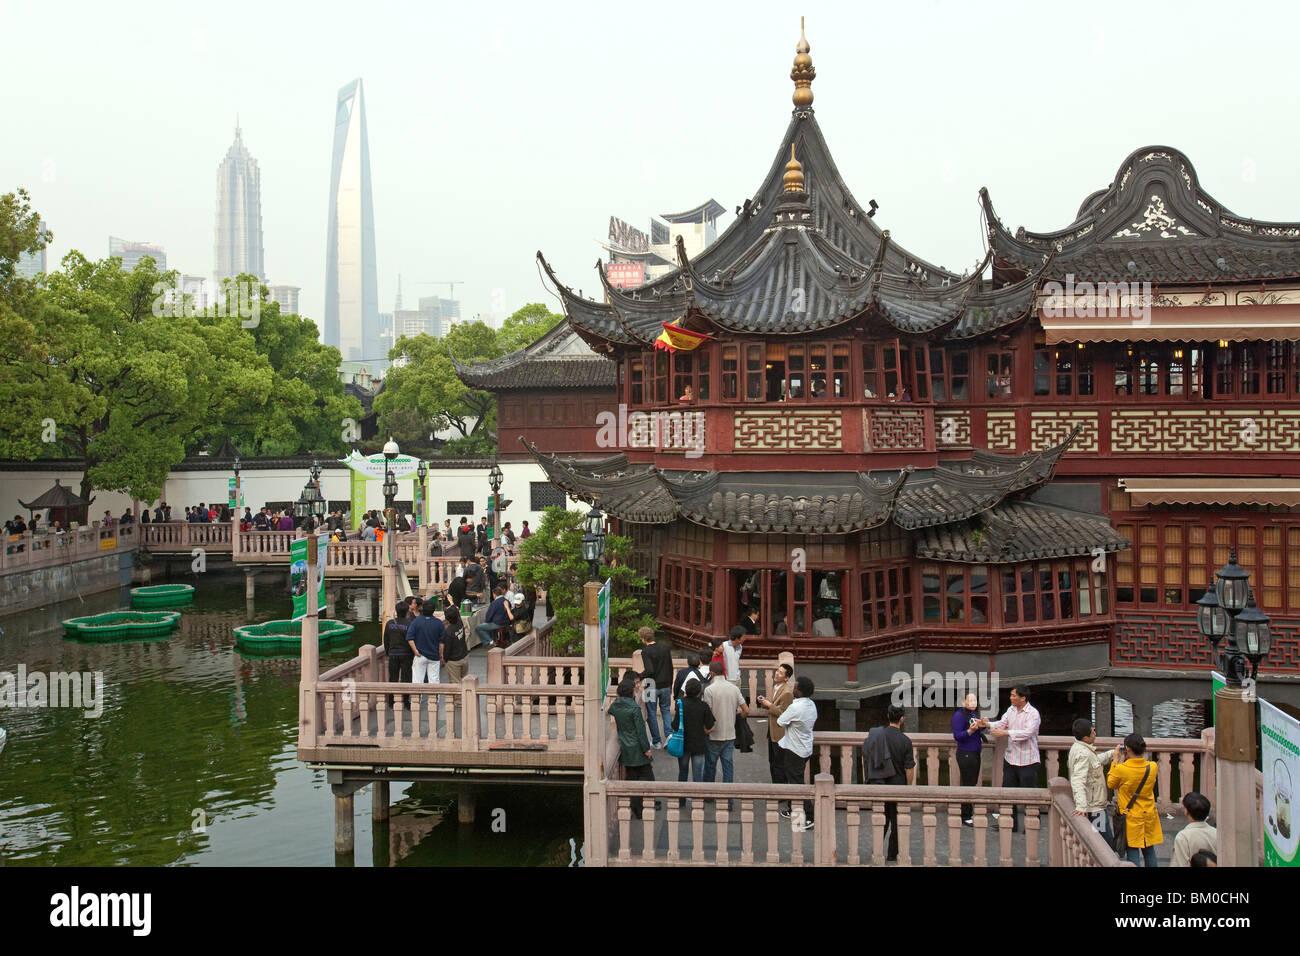 Mid Lake Pavilion Teahouse, Bridge of nine turnings, Mid-lake Pavilion, in Yu Yuan Gardens, Huxinting Teahouse, - Stock Image